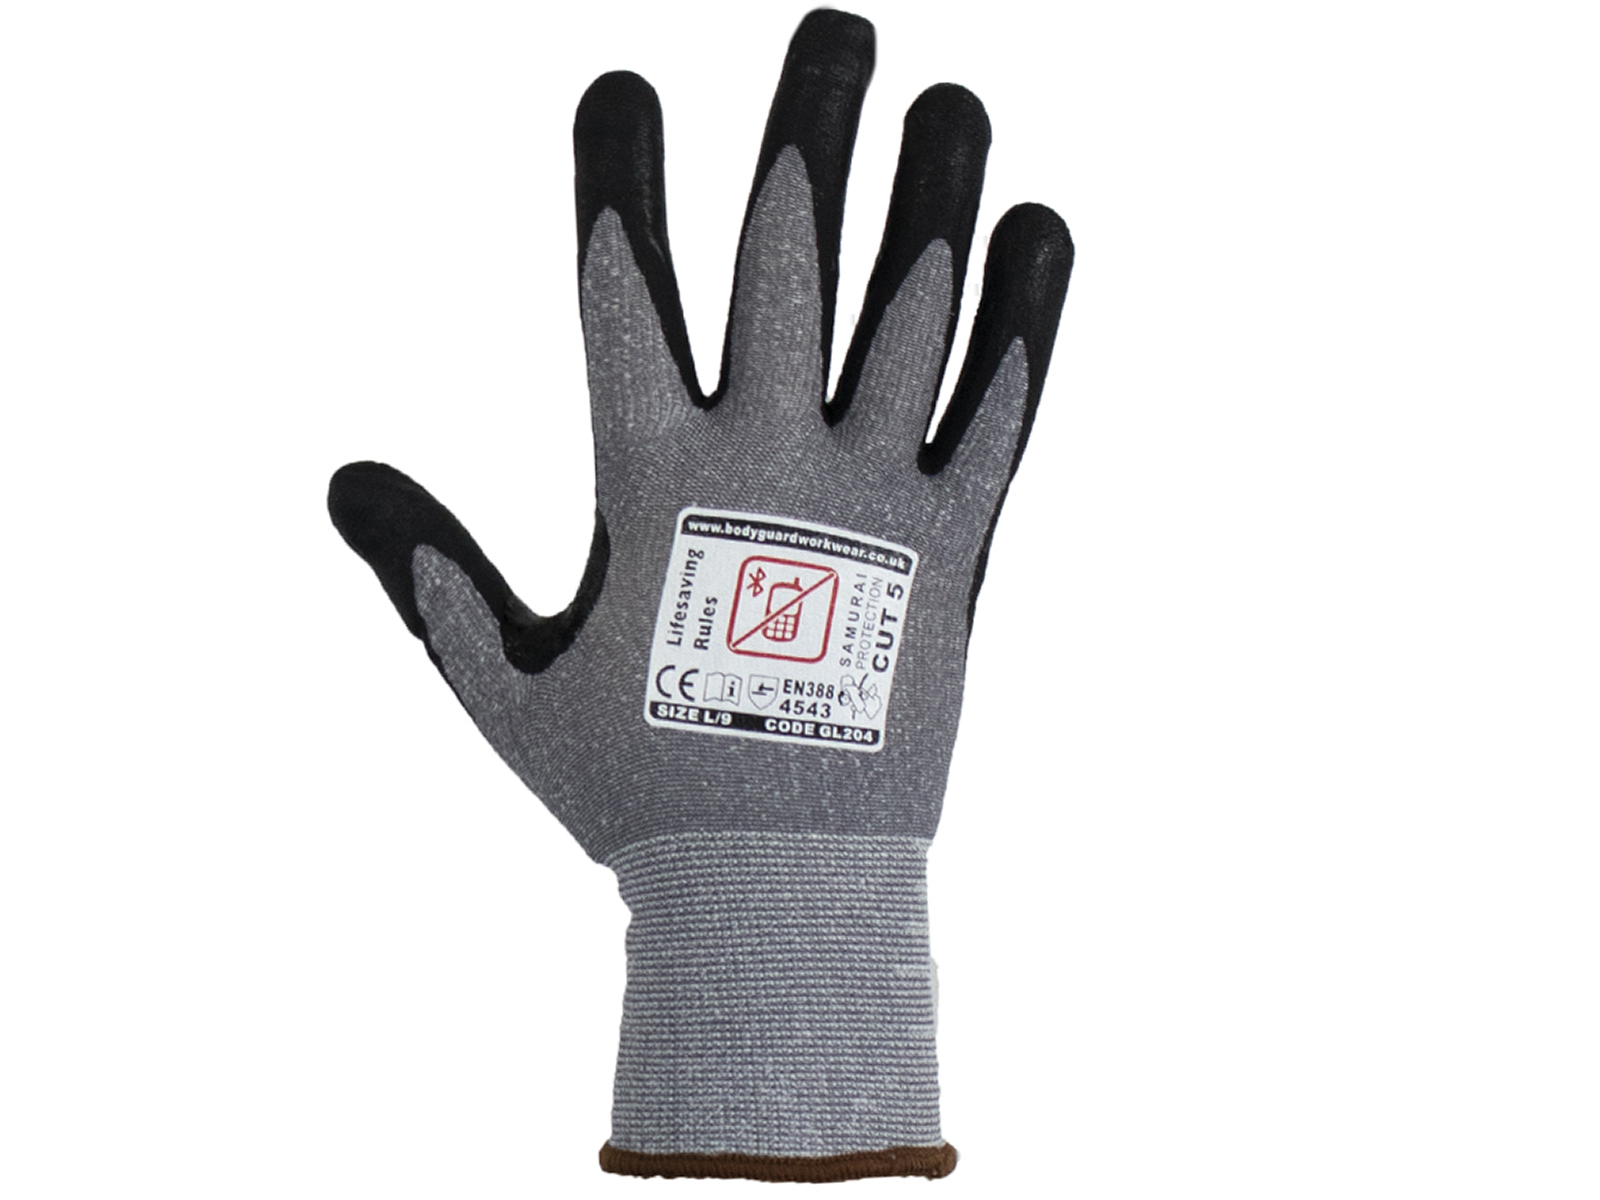 Samurai Super lite Cut 5 Safety Gloves w/ Touch Screen Technology